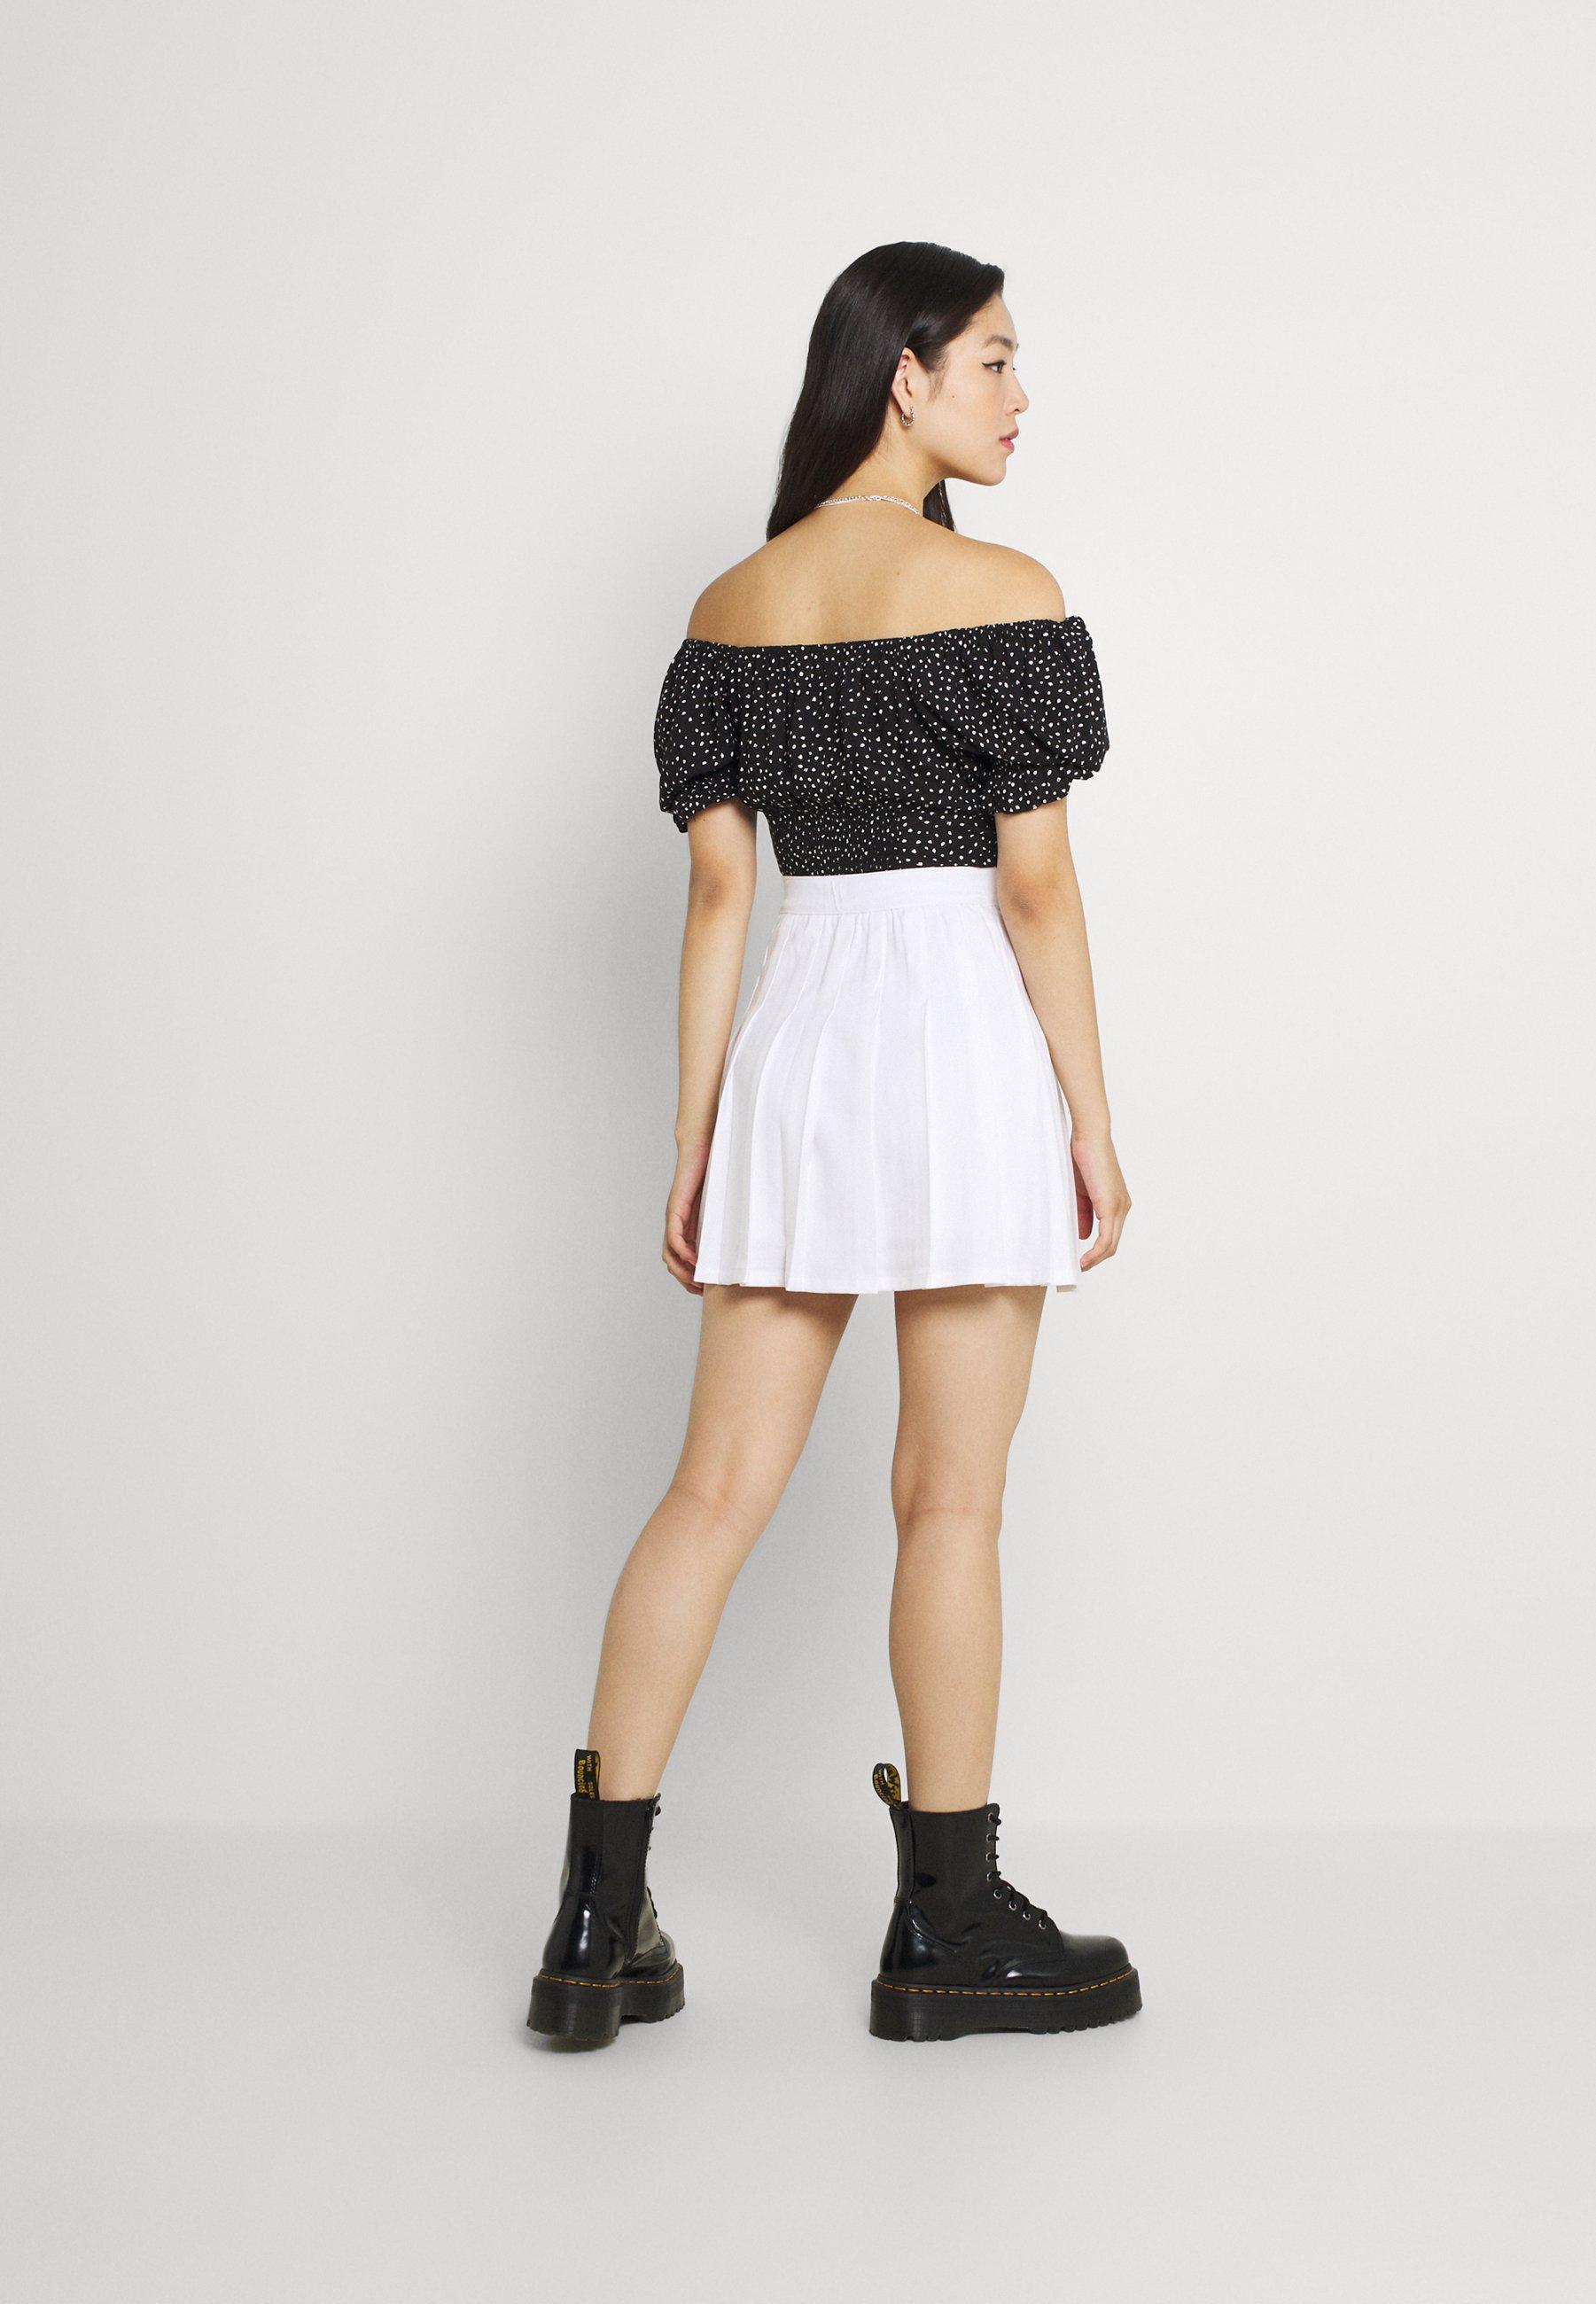 Femme MINI SKIRT - Minijupe